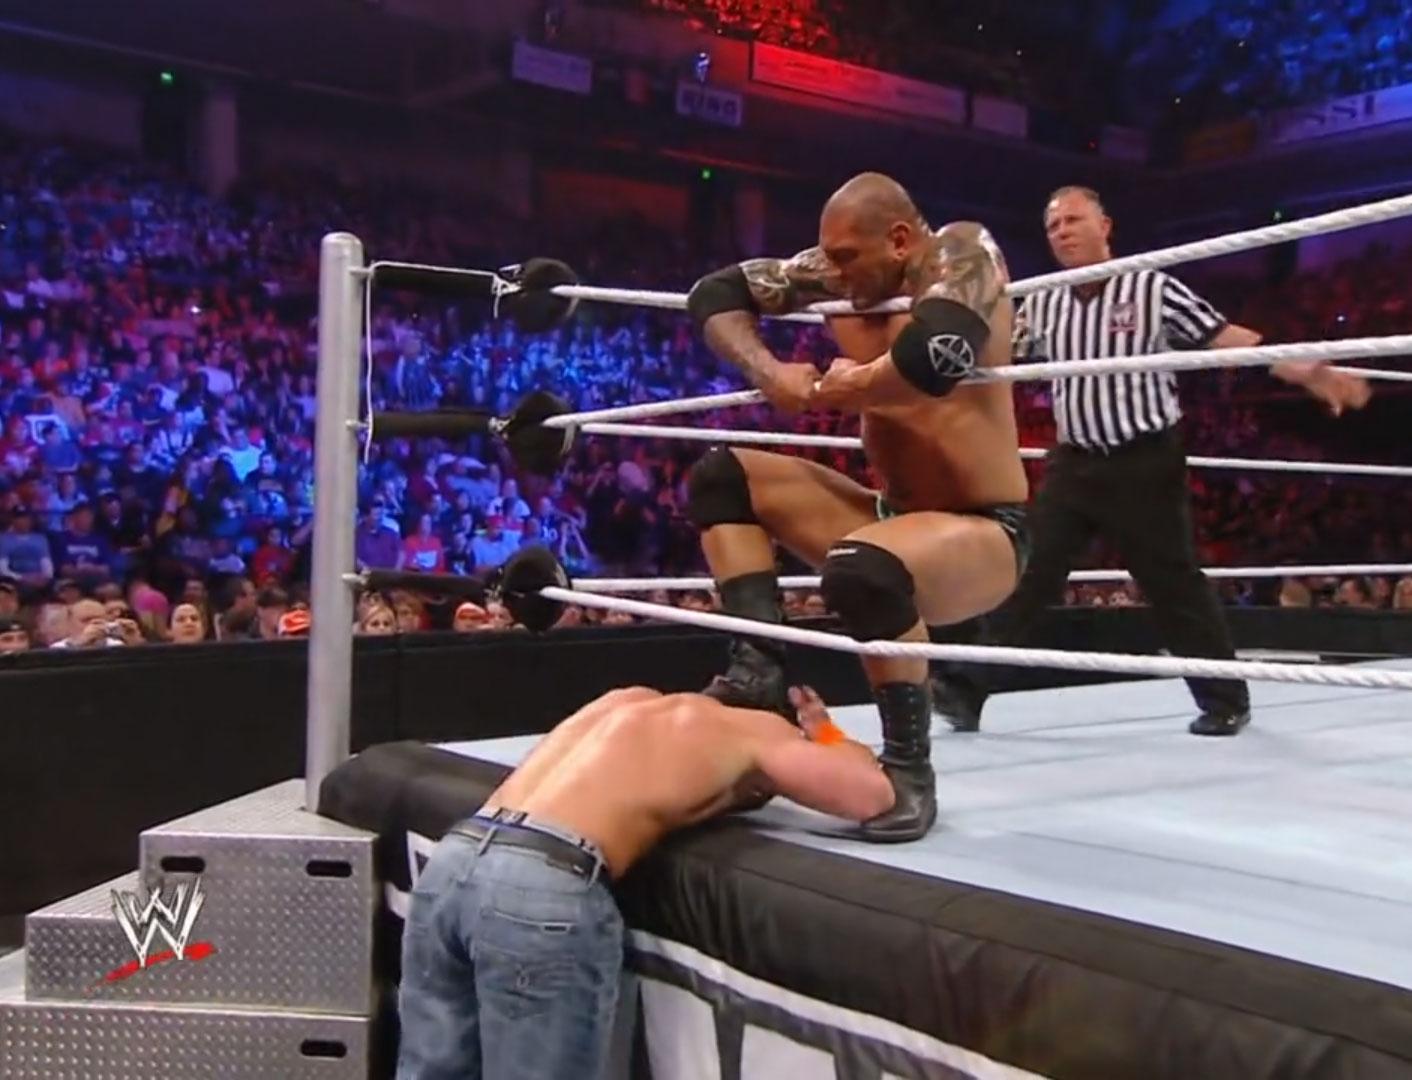 John Cena vs. Batista Last Man Standing WWE Extreme Rules '10 Apr 25th 2010